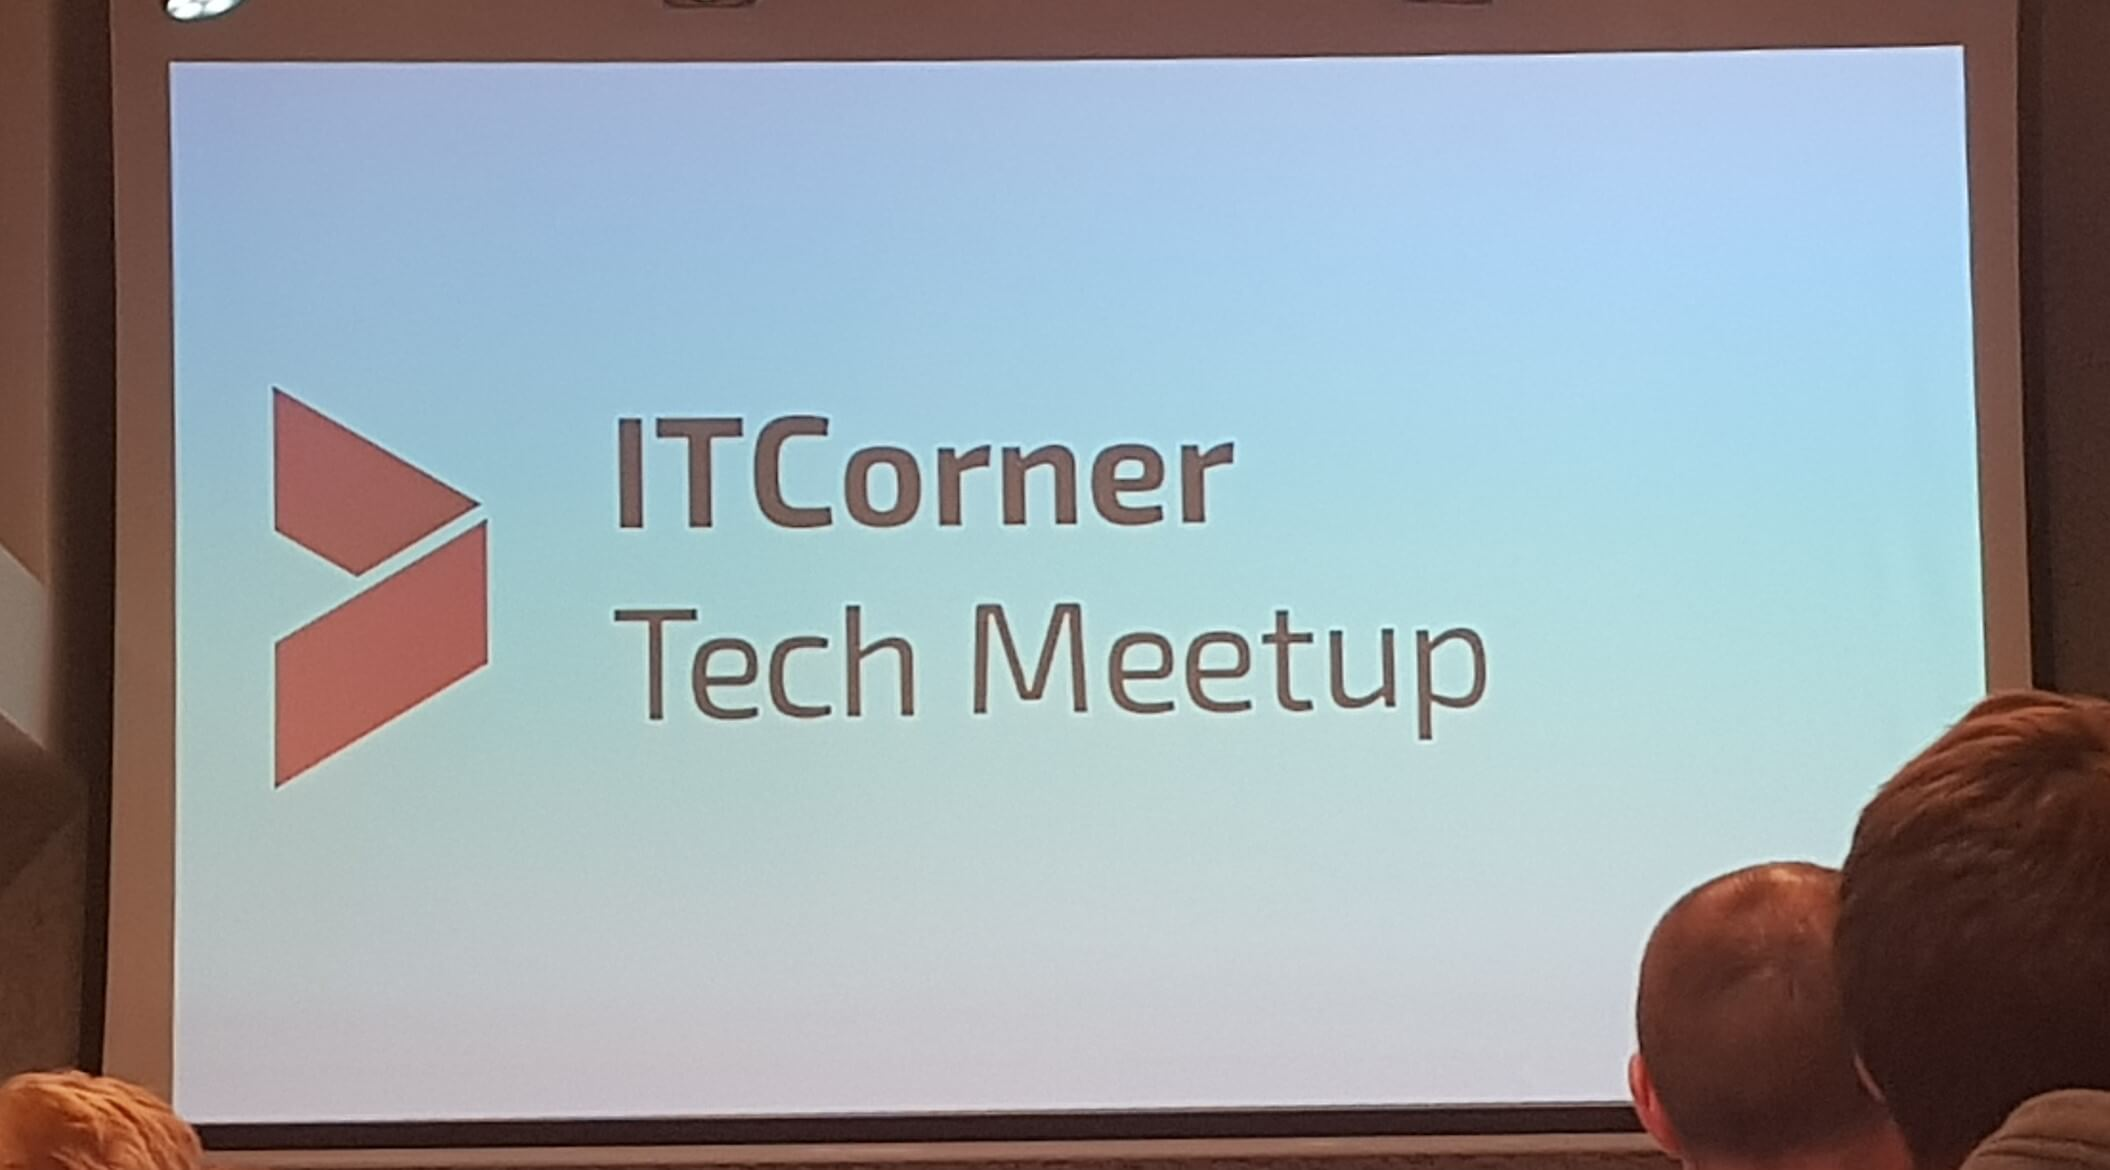 ITCorner Tech Meetup